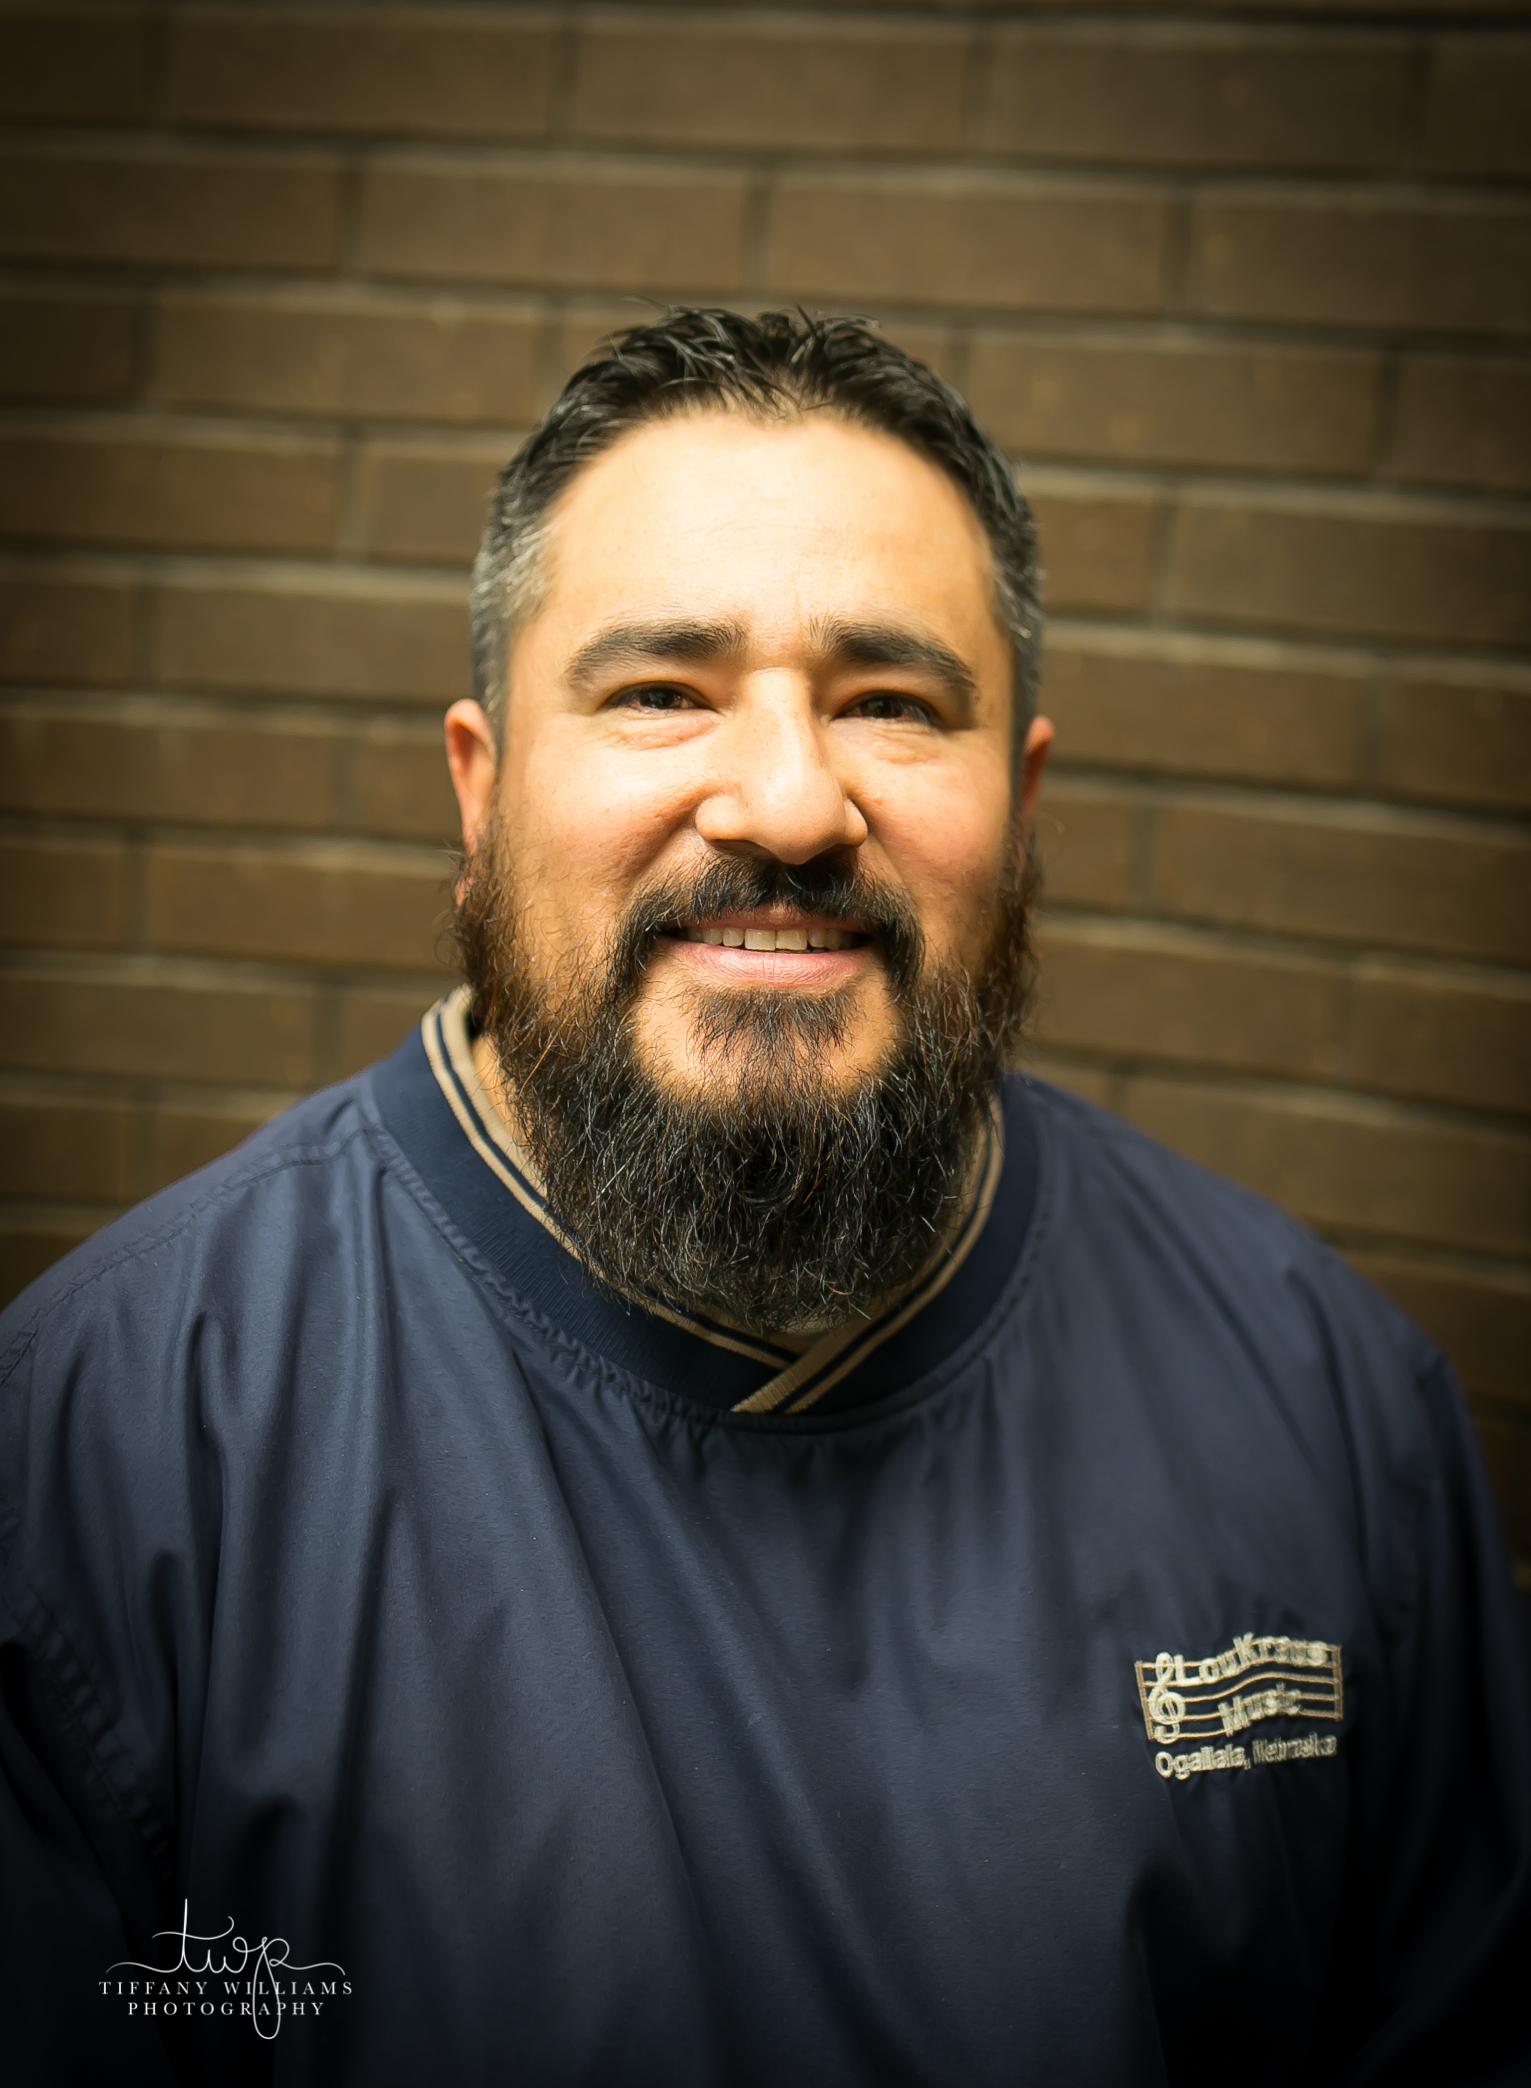 Luis Juarez